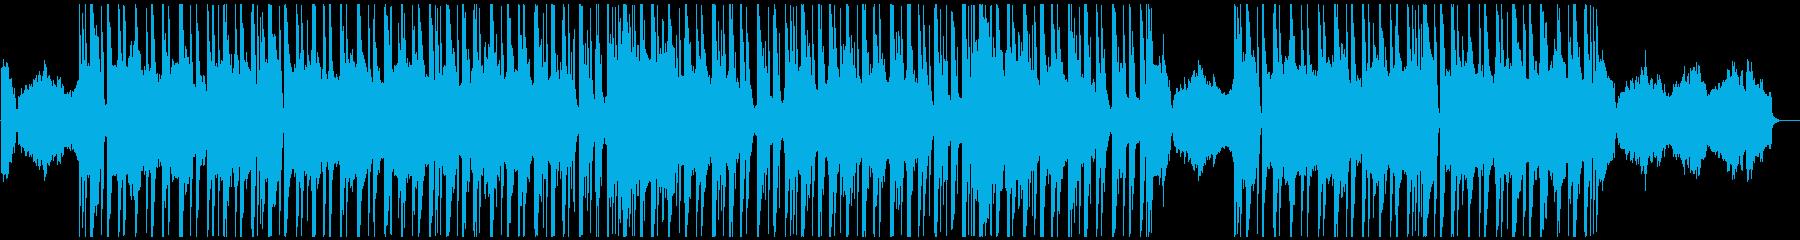 Radio City Chillの再生済みの波形